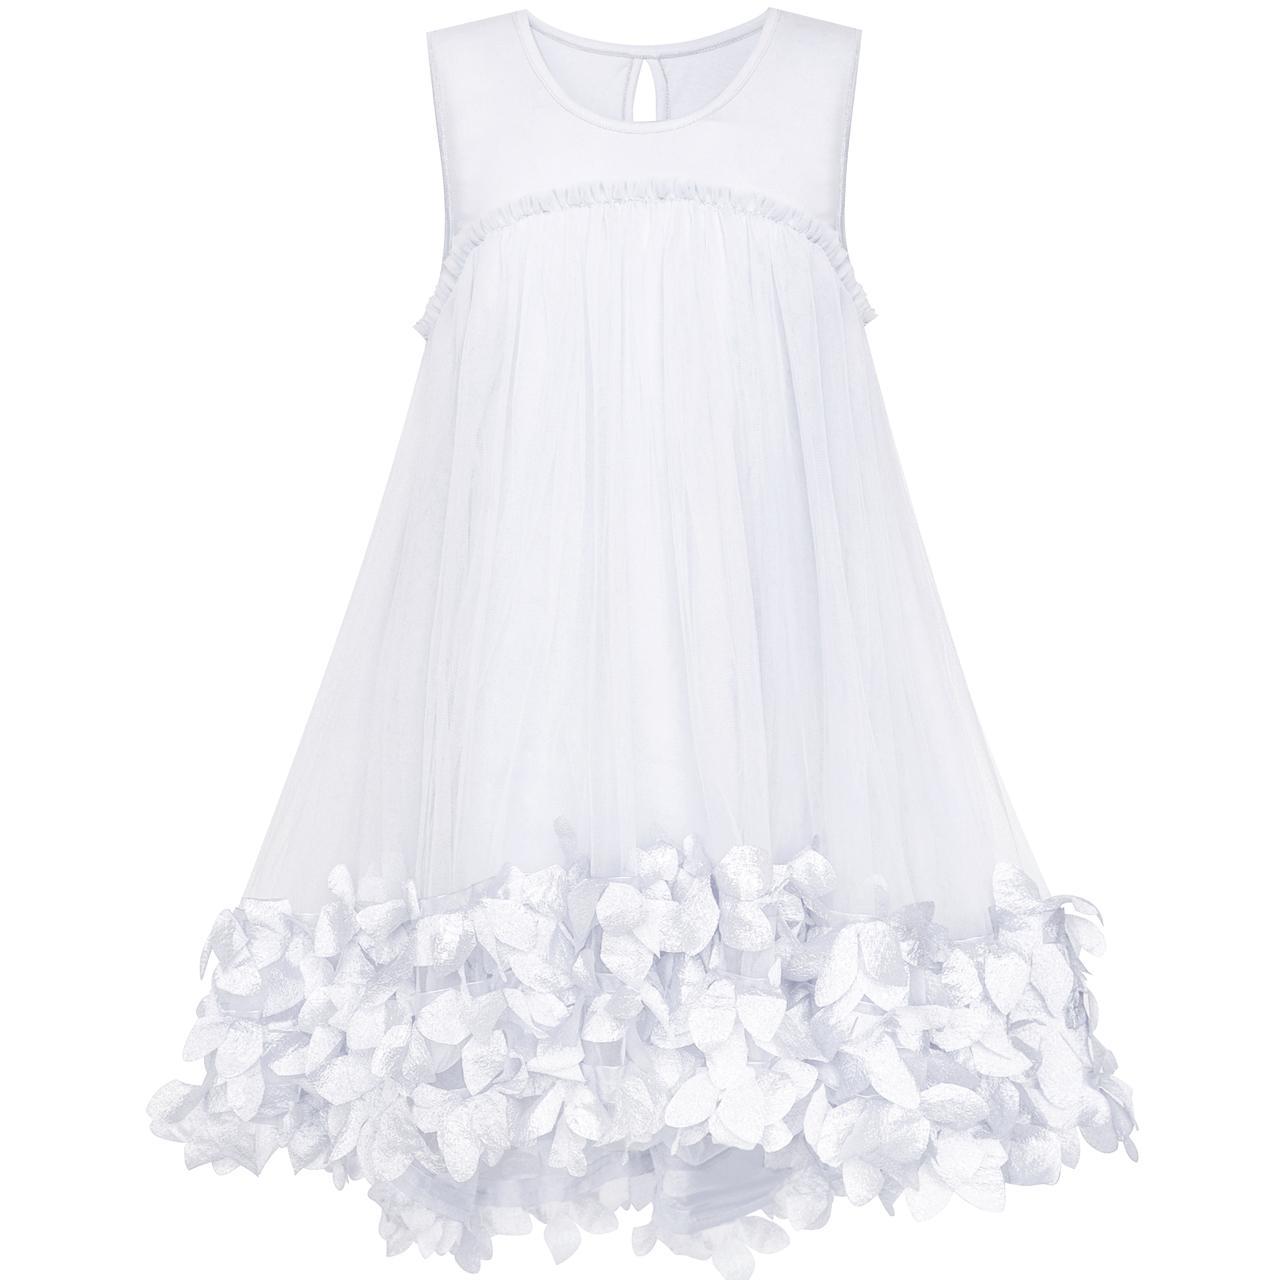 Sunny Fashion Flower Girl Dress A-line Cute Handbag White Princess Sundress Cotton 2018 Summer Wedding Party Dresses Size 5-10